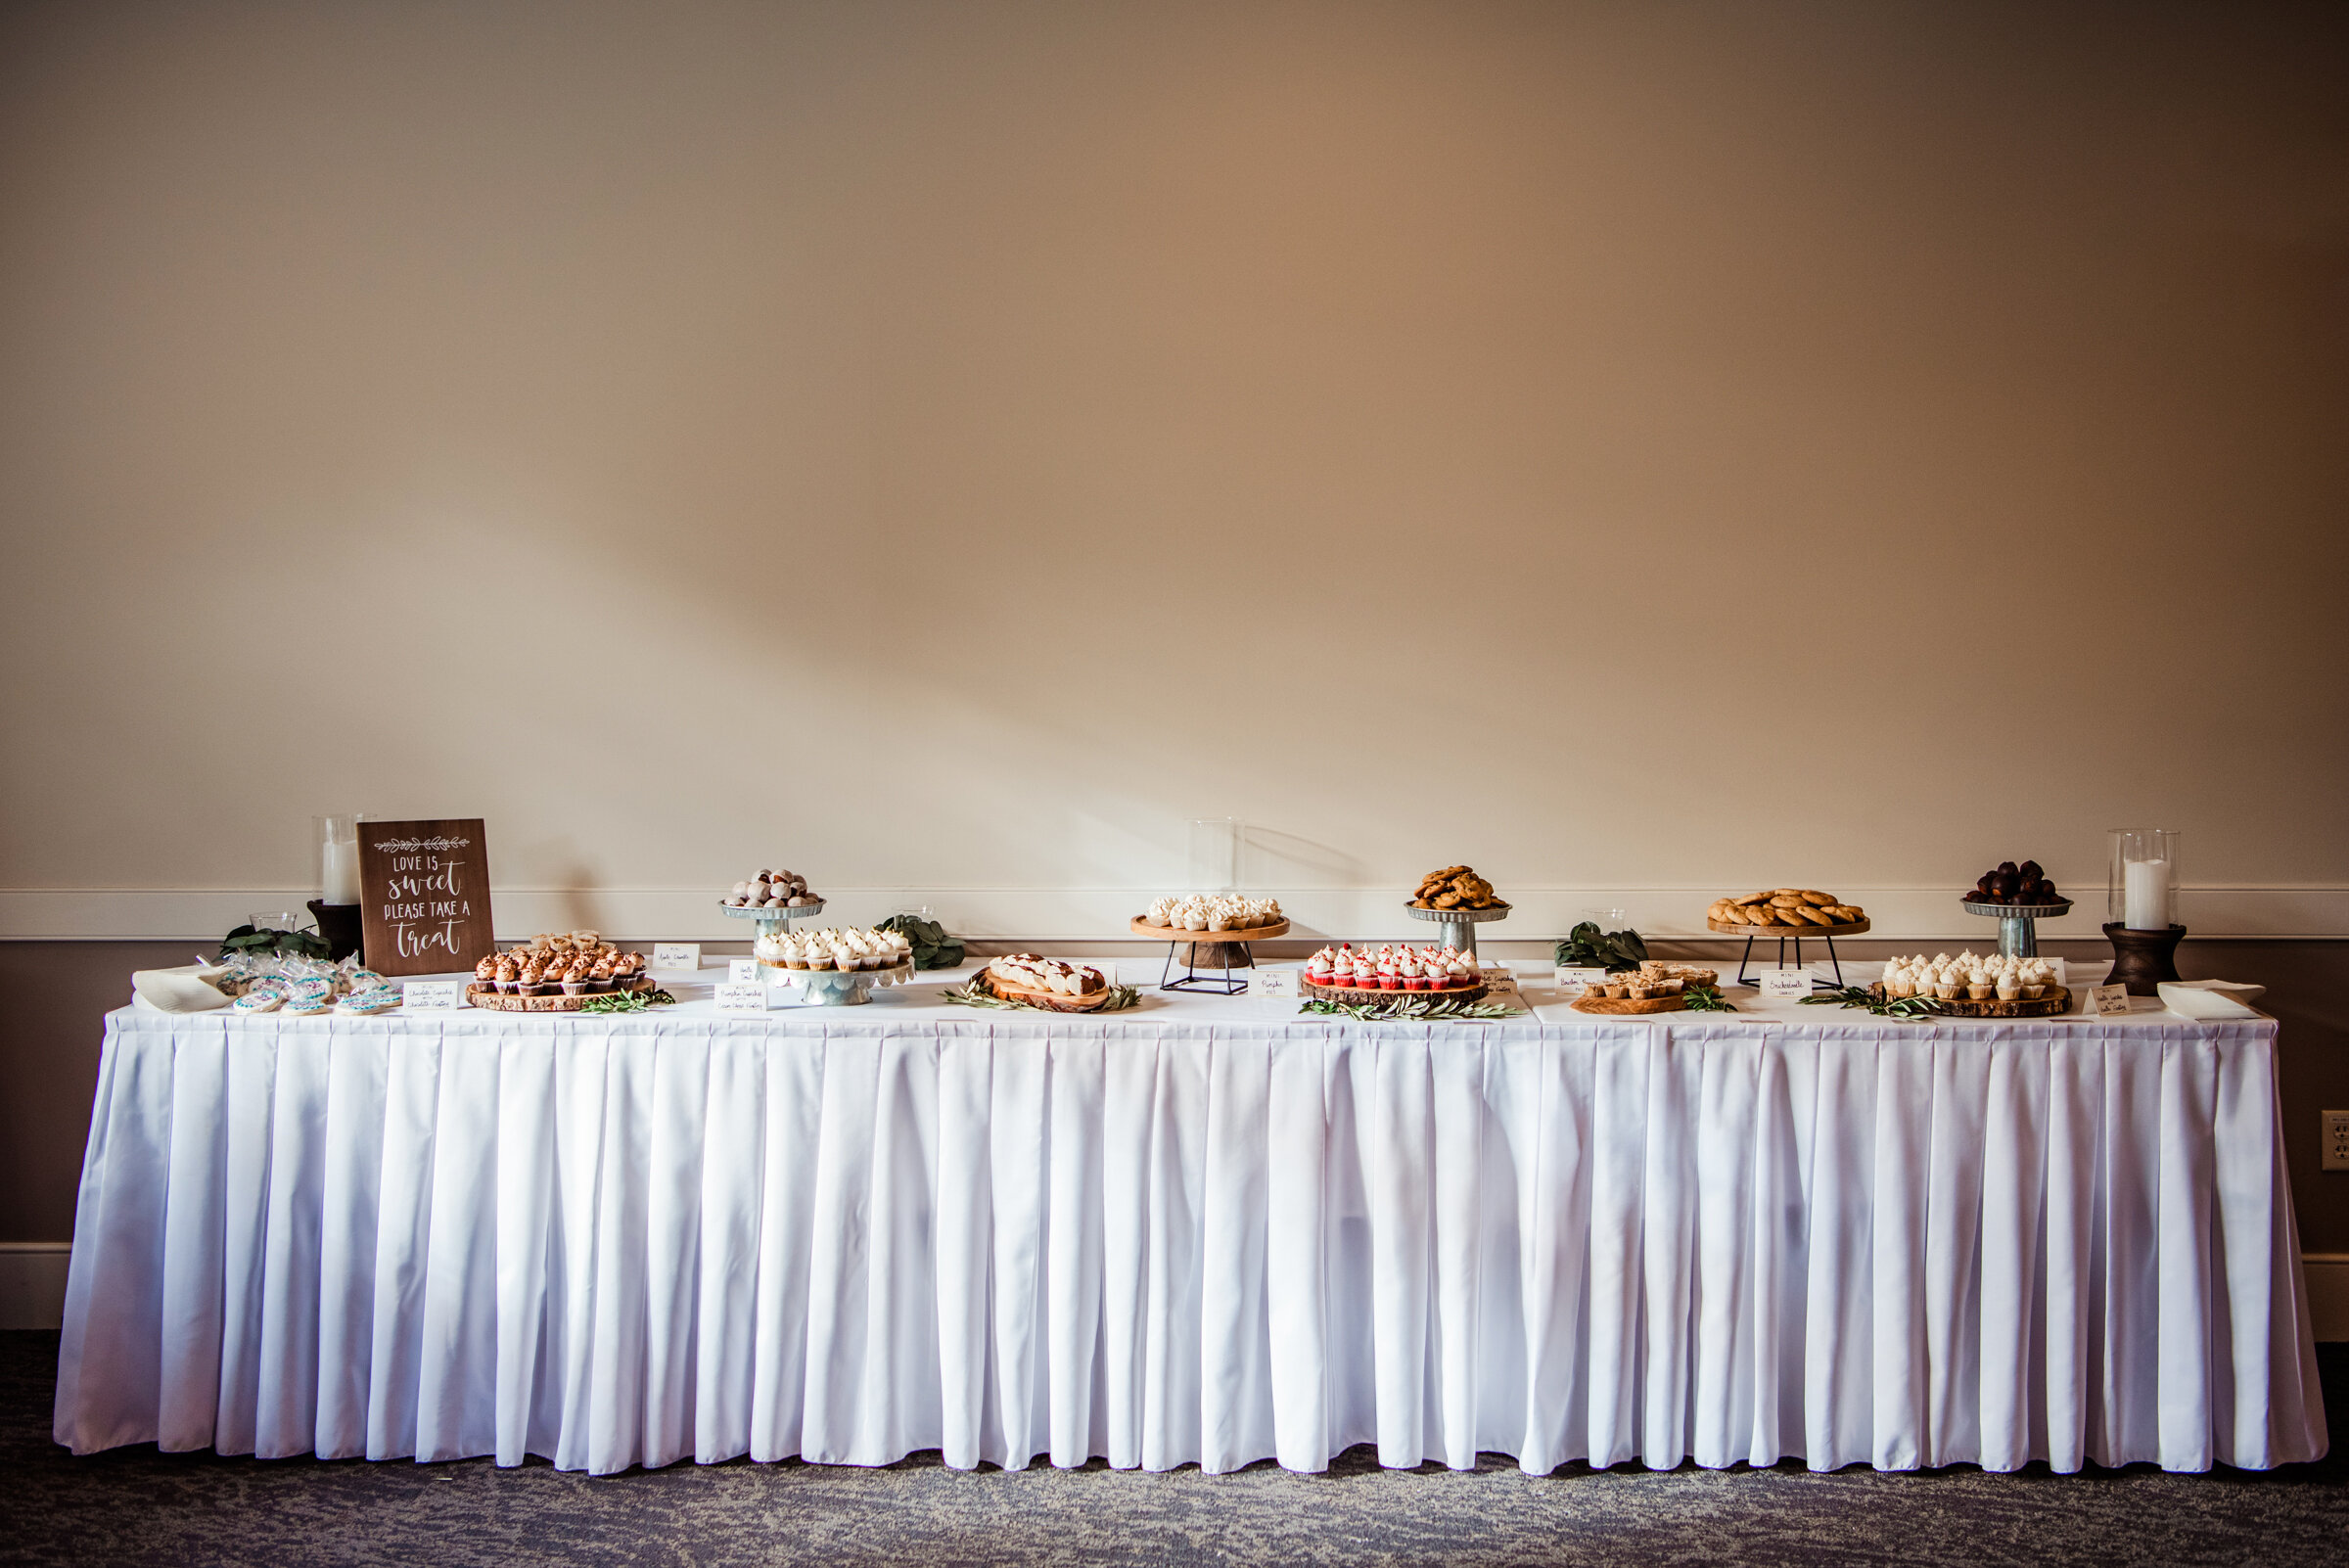 Deerfield_Country_Club_Rochester_Wedding_JILL_STUDIO_Rochester_NY_Photographer_DSC_6660.jpg